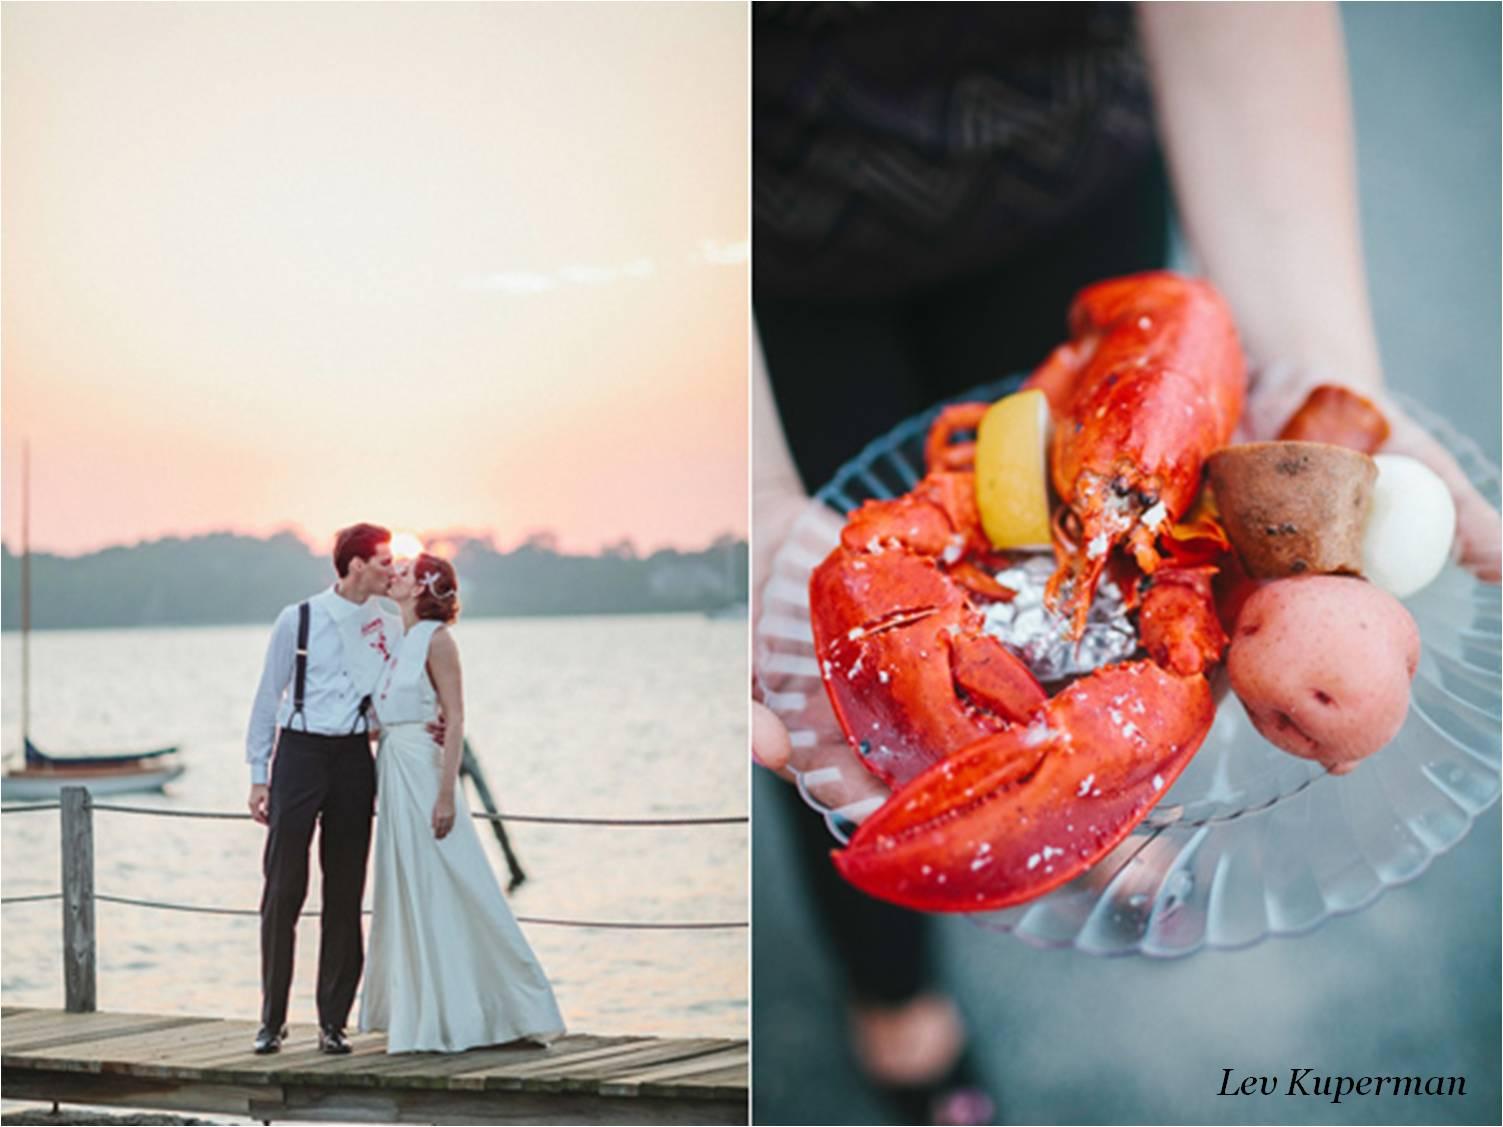 Snow Crab Love: August 2013